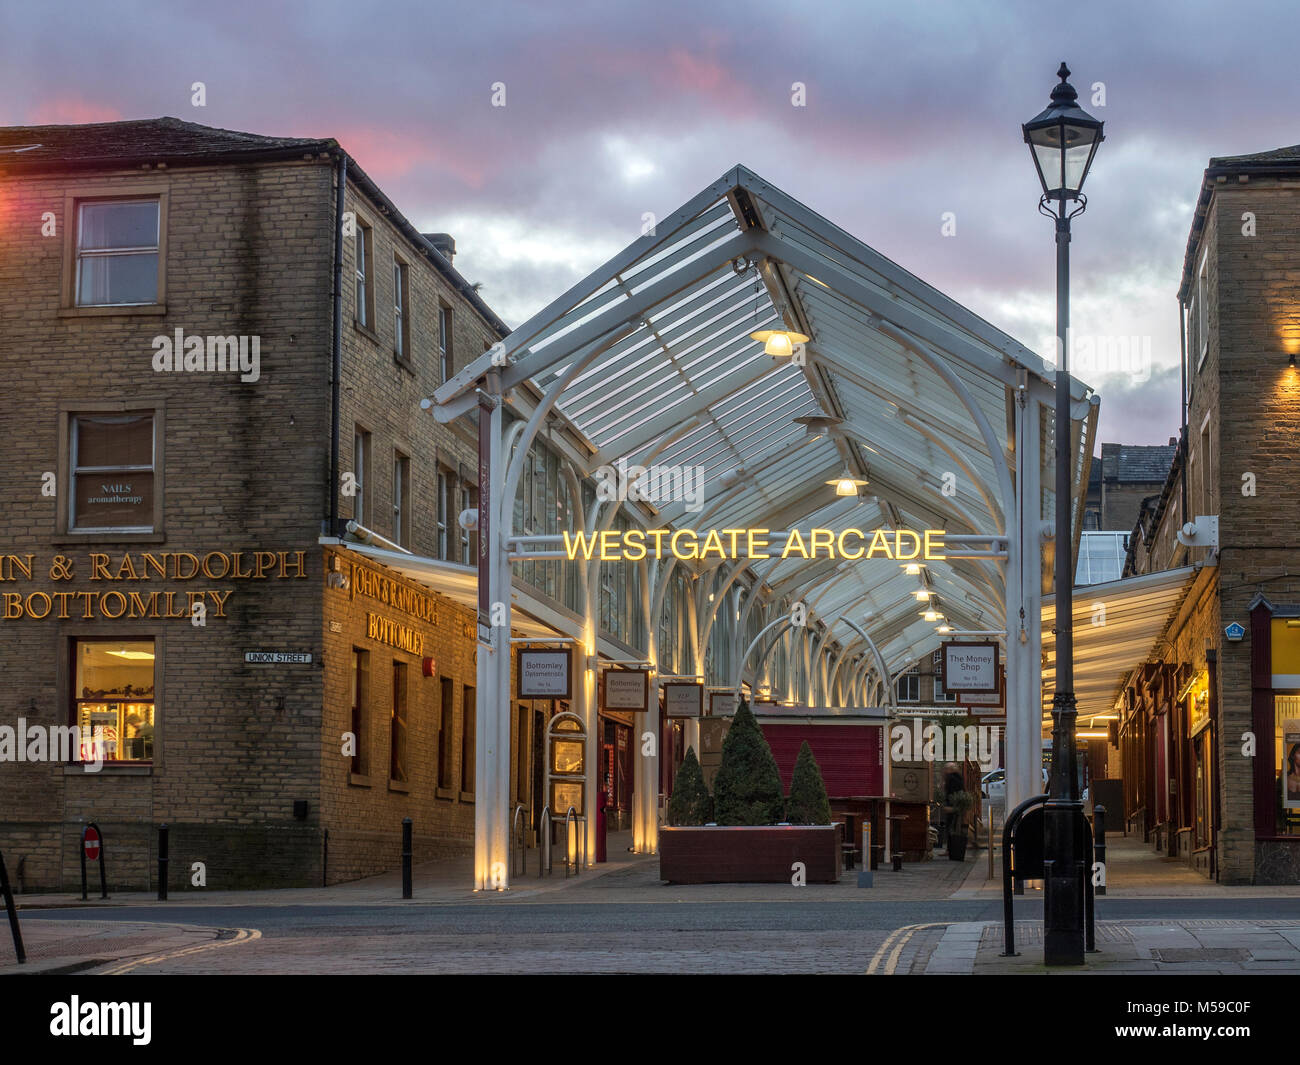 westgate arcade at dusk in halifax west yorkshire england stock